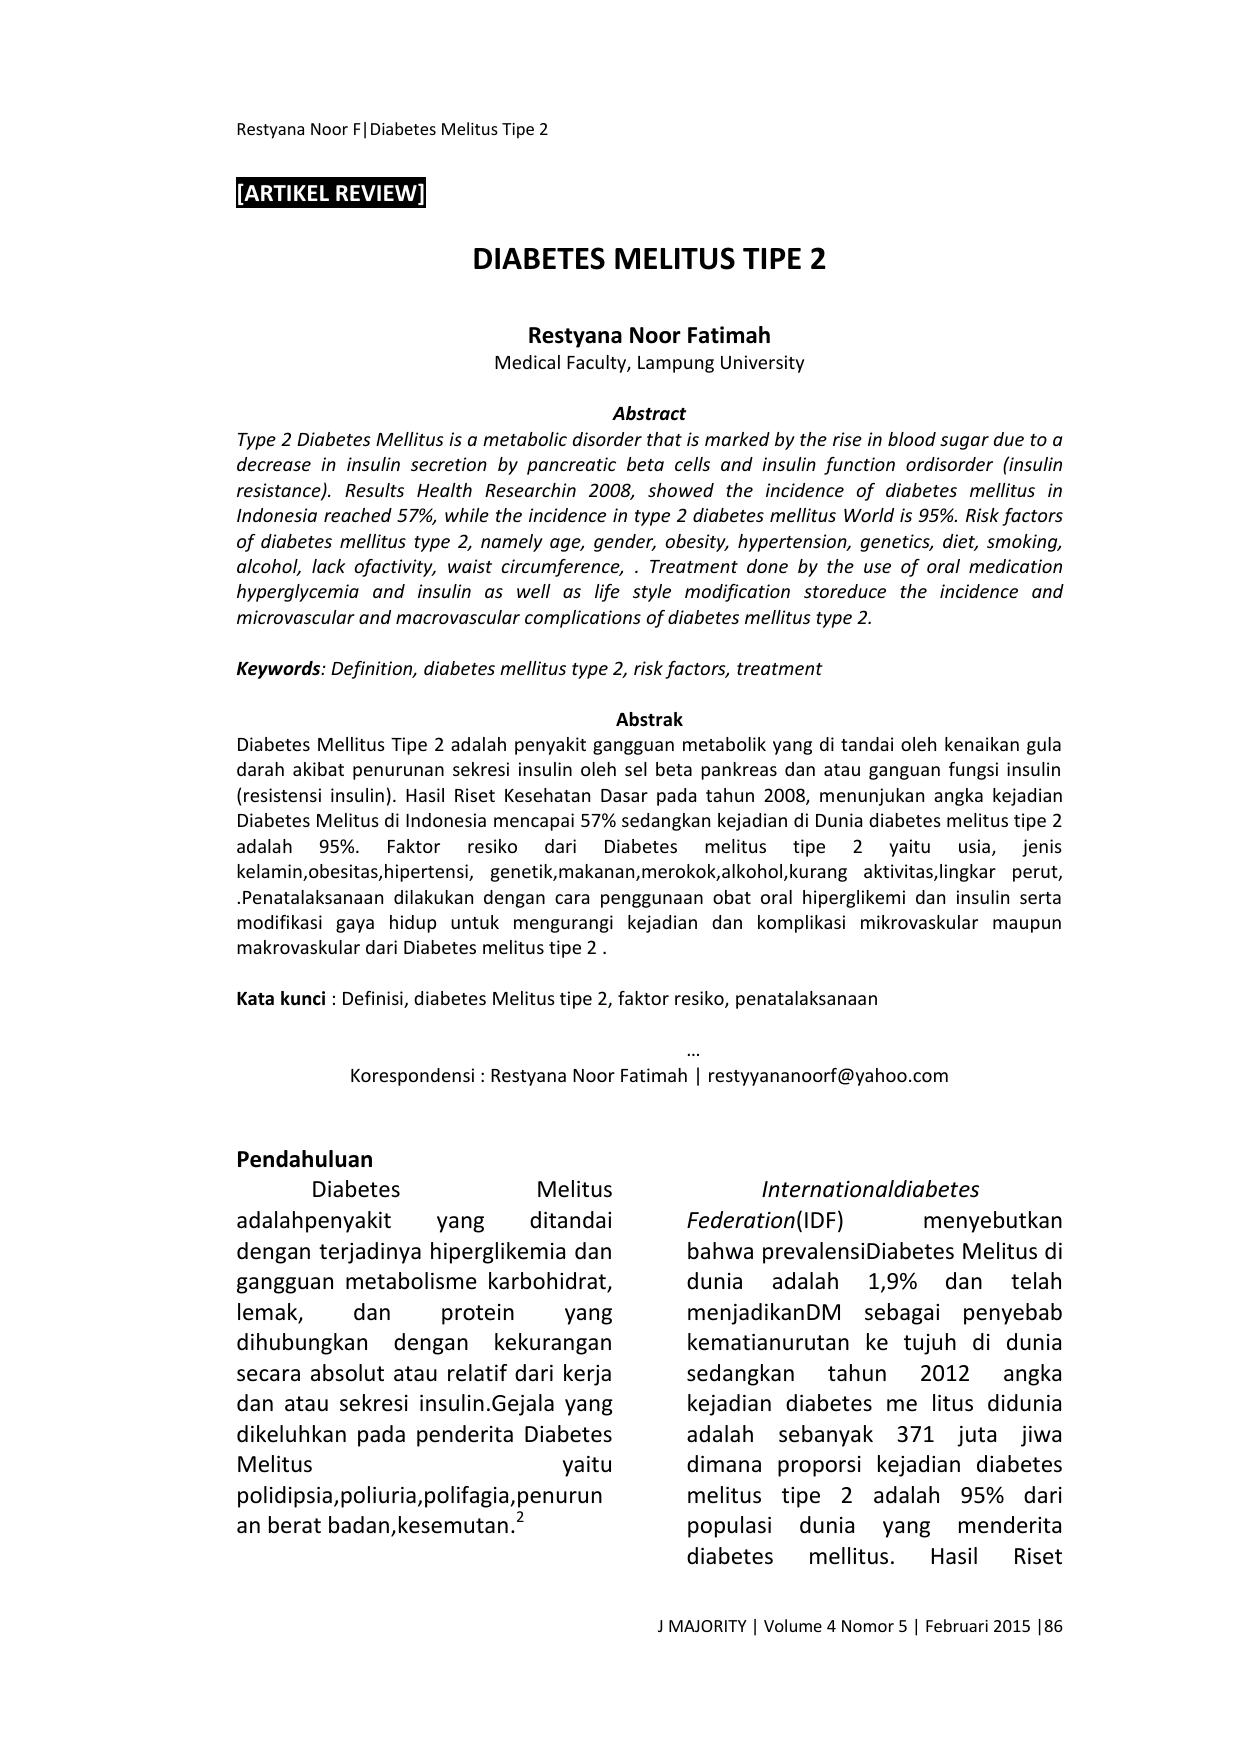 Diabetes Melitus Tipe 2 Jurnal Fakultas Kedokteran Universitas